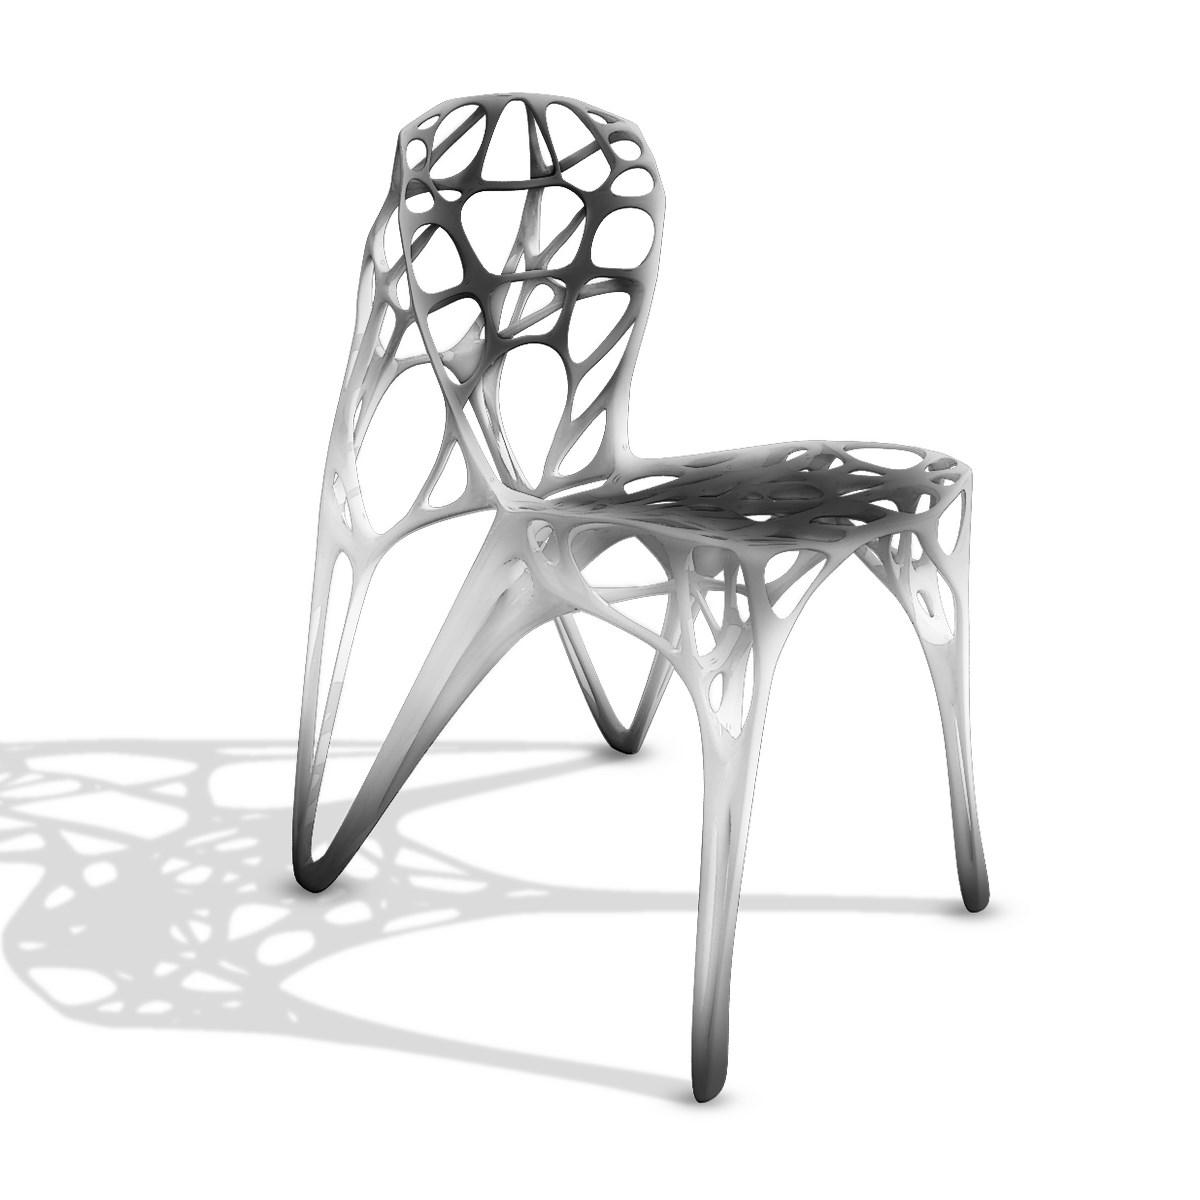 Generico_3D-Model (Copiar)